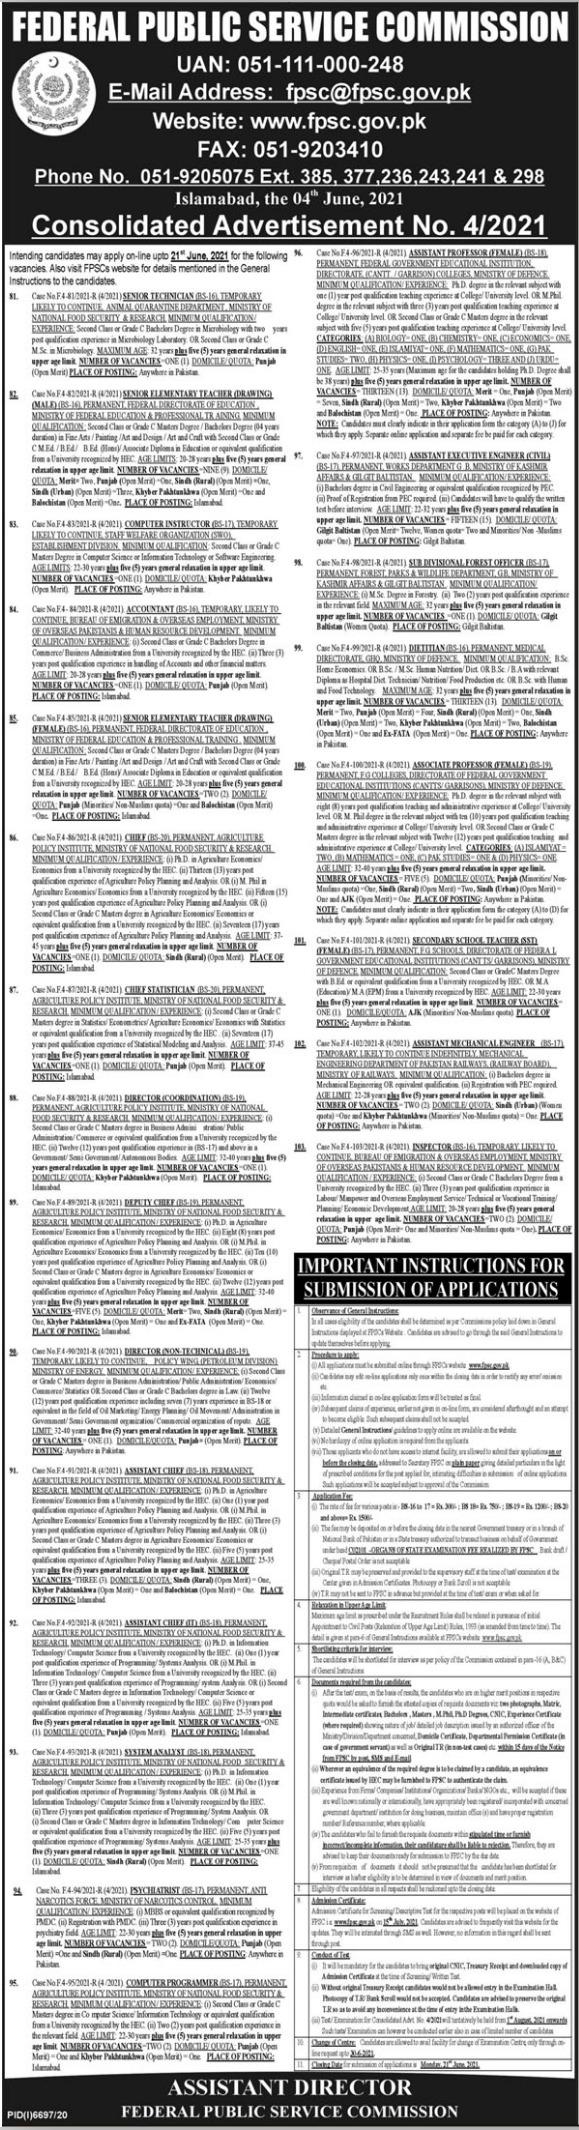 FPSC Jobs Advertisement No 4 June Jobs 2021